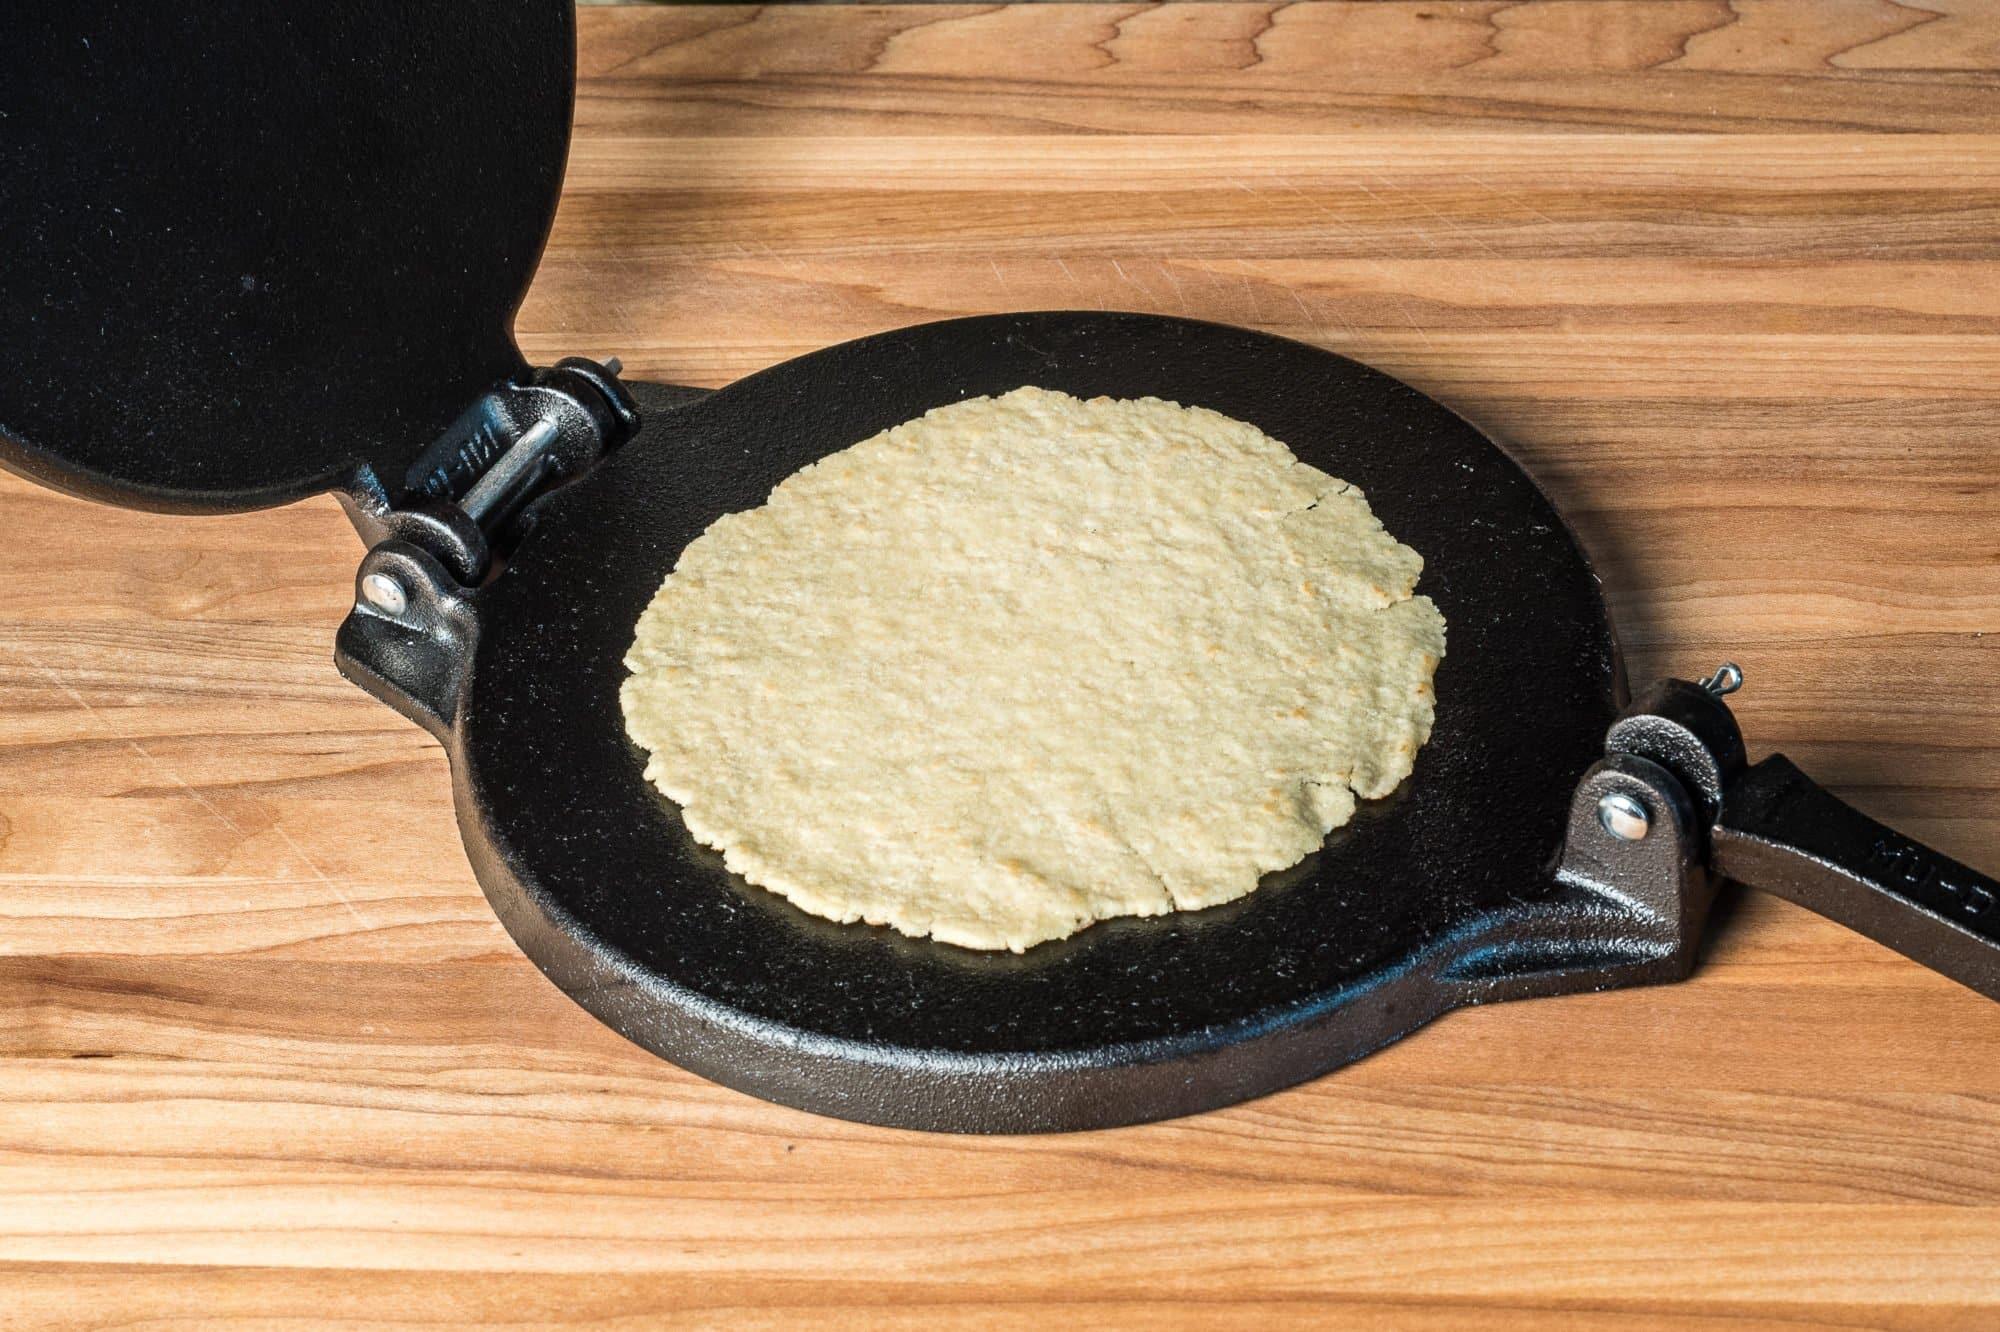 Keto Almond Flour Tortillas - Tasty Low Carb